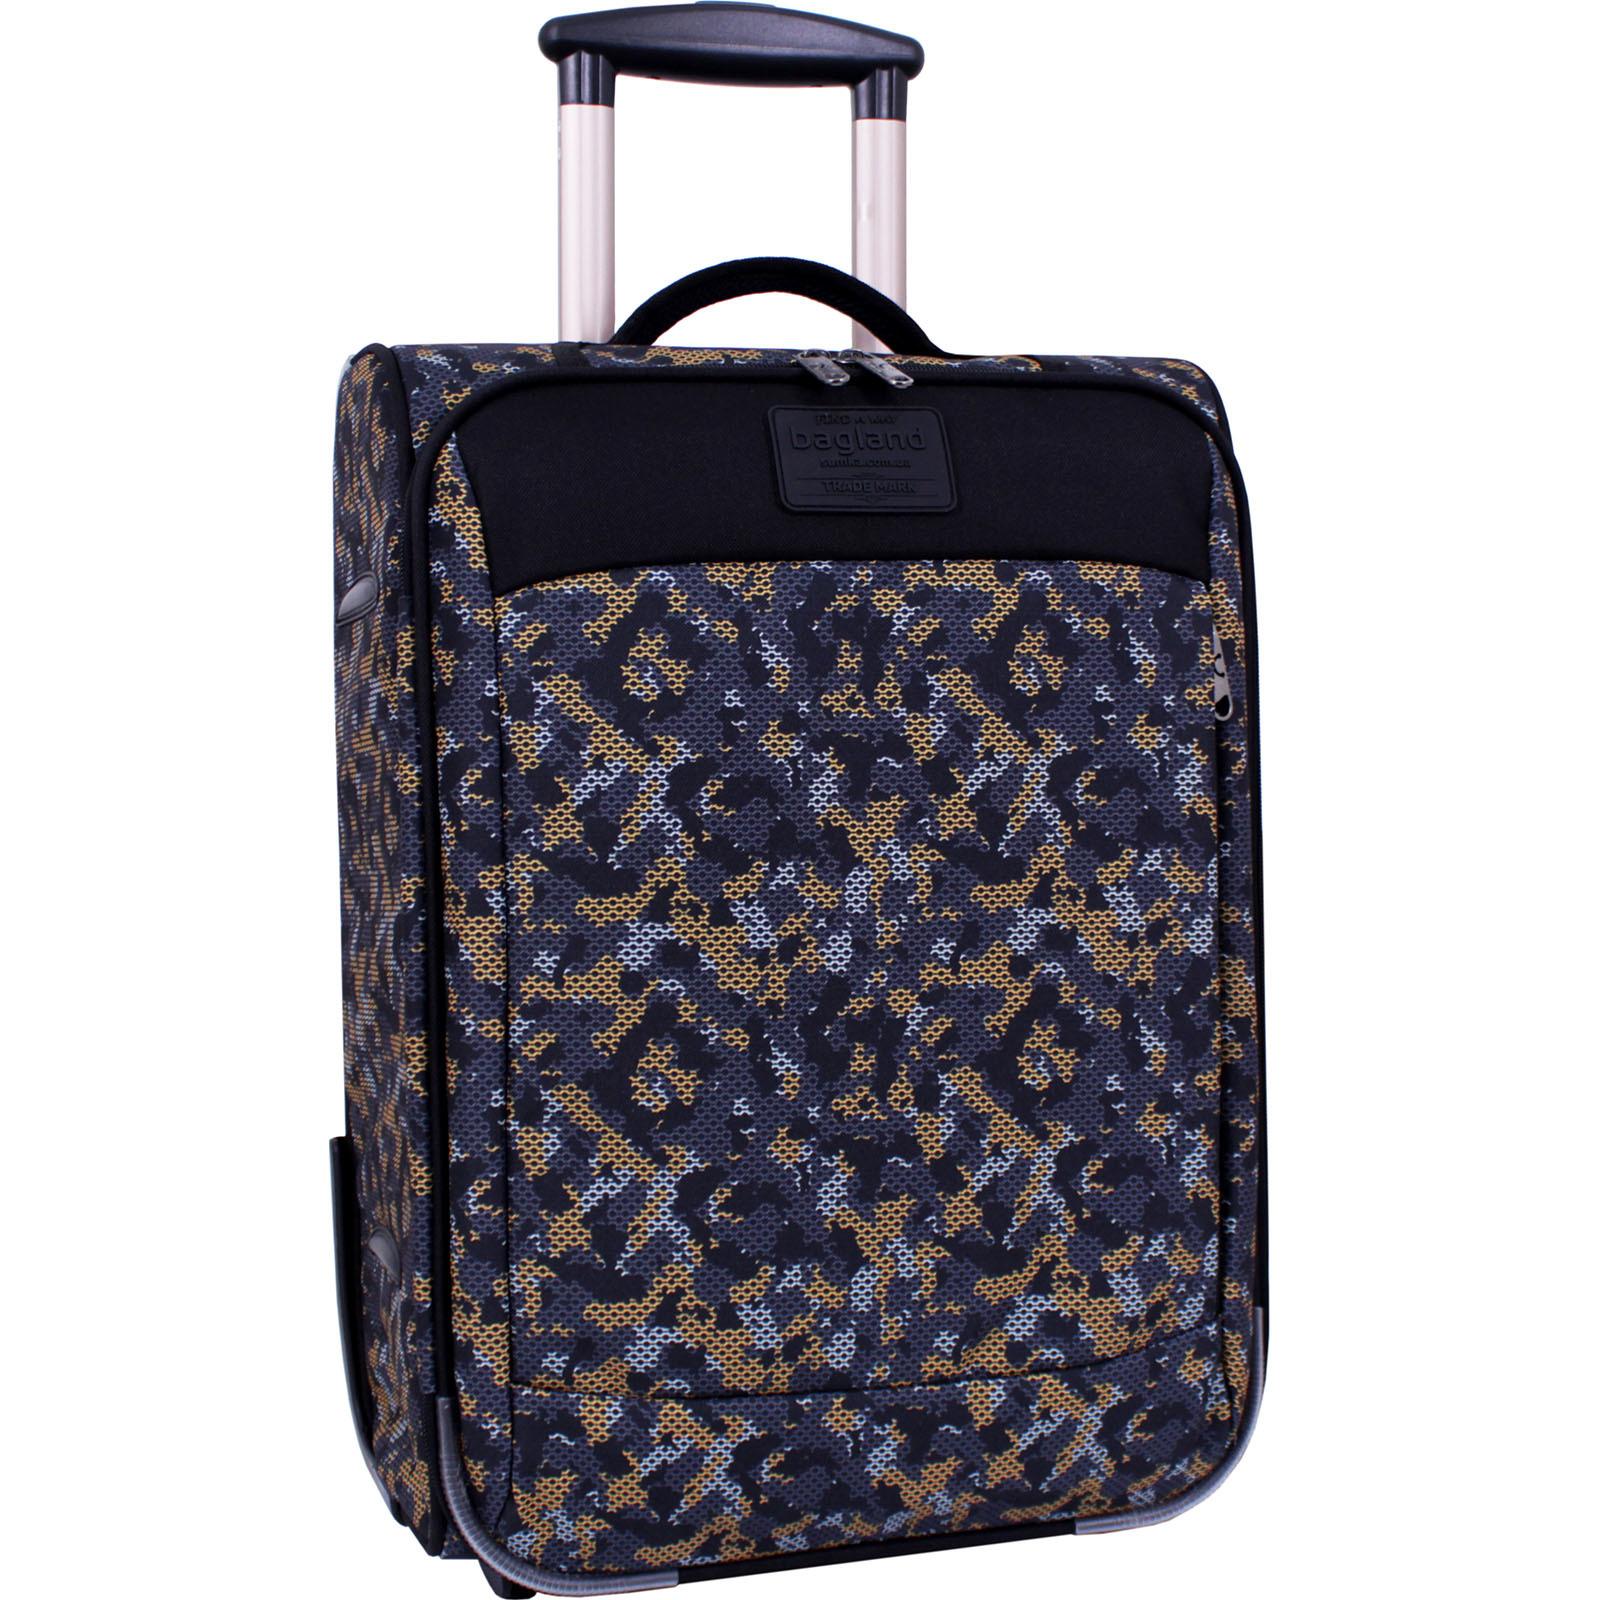 Дорожные чемоданы Чемодан Bagland Vichenzo 32 л. сублімація 455 (0037666194) IMG_4106_суб.455_.JPG